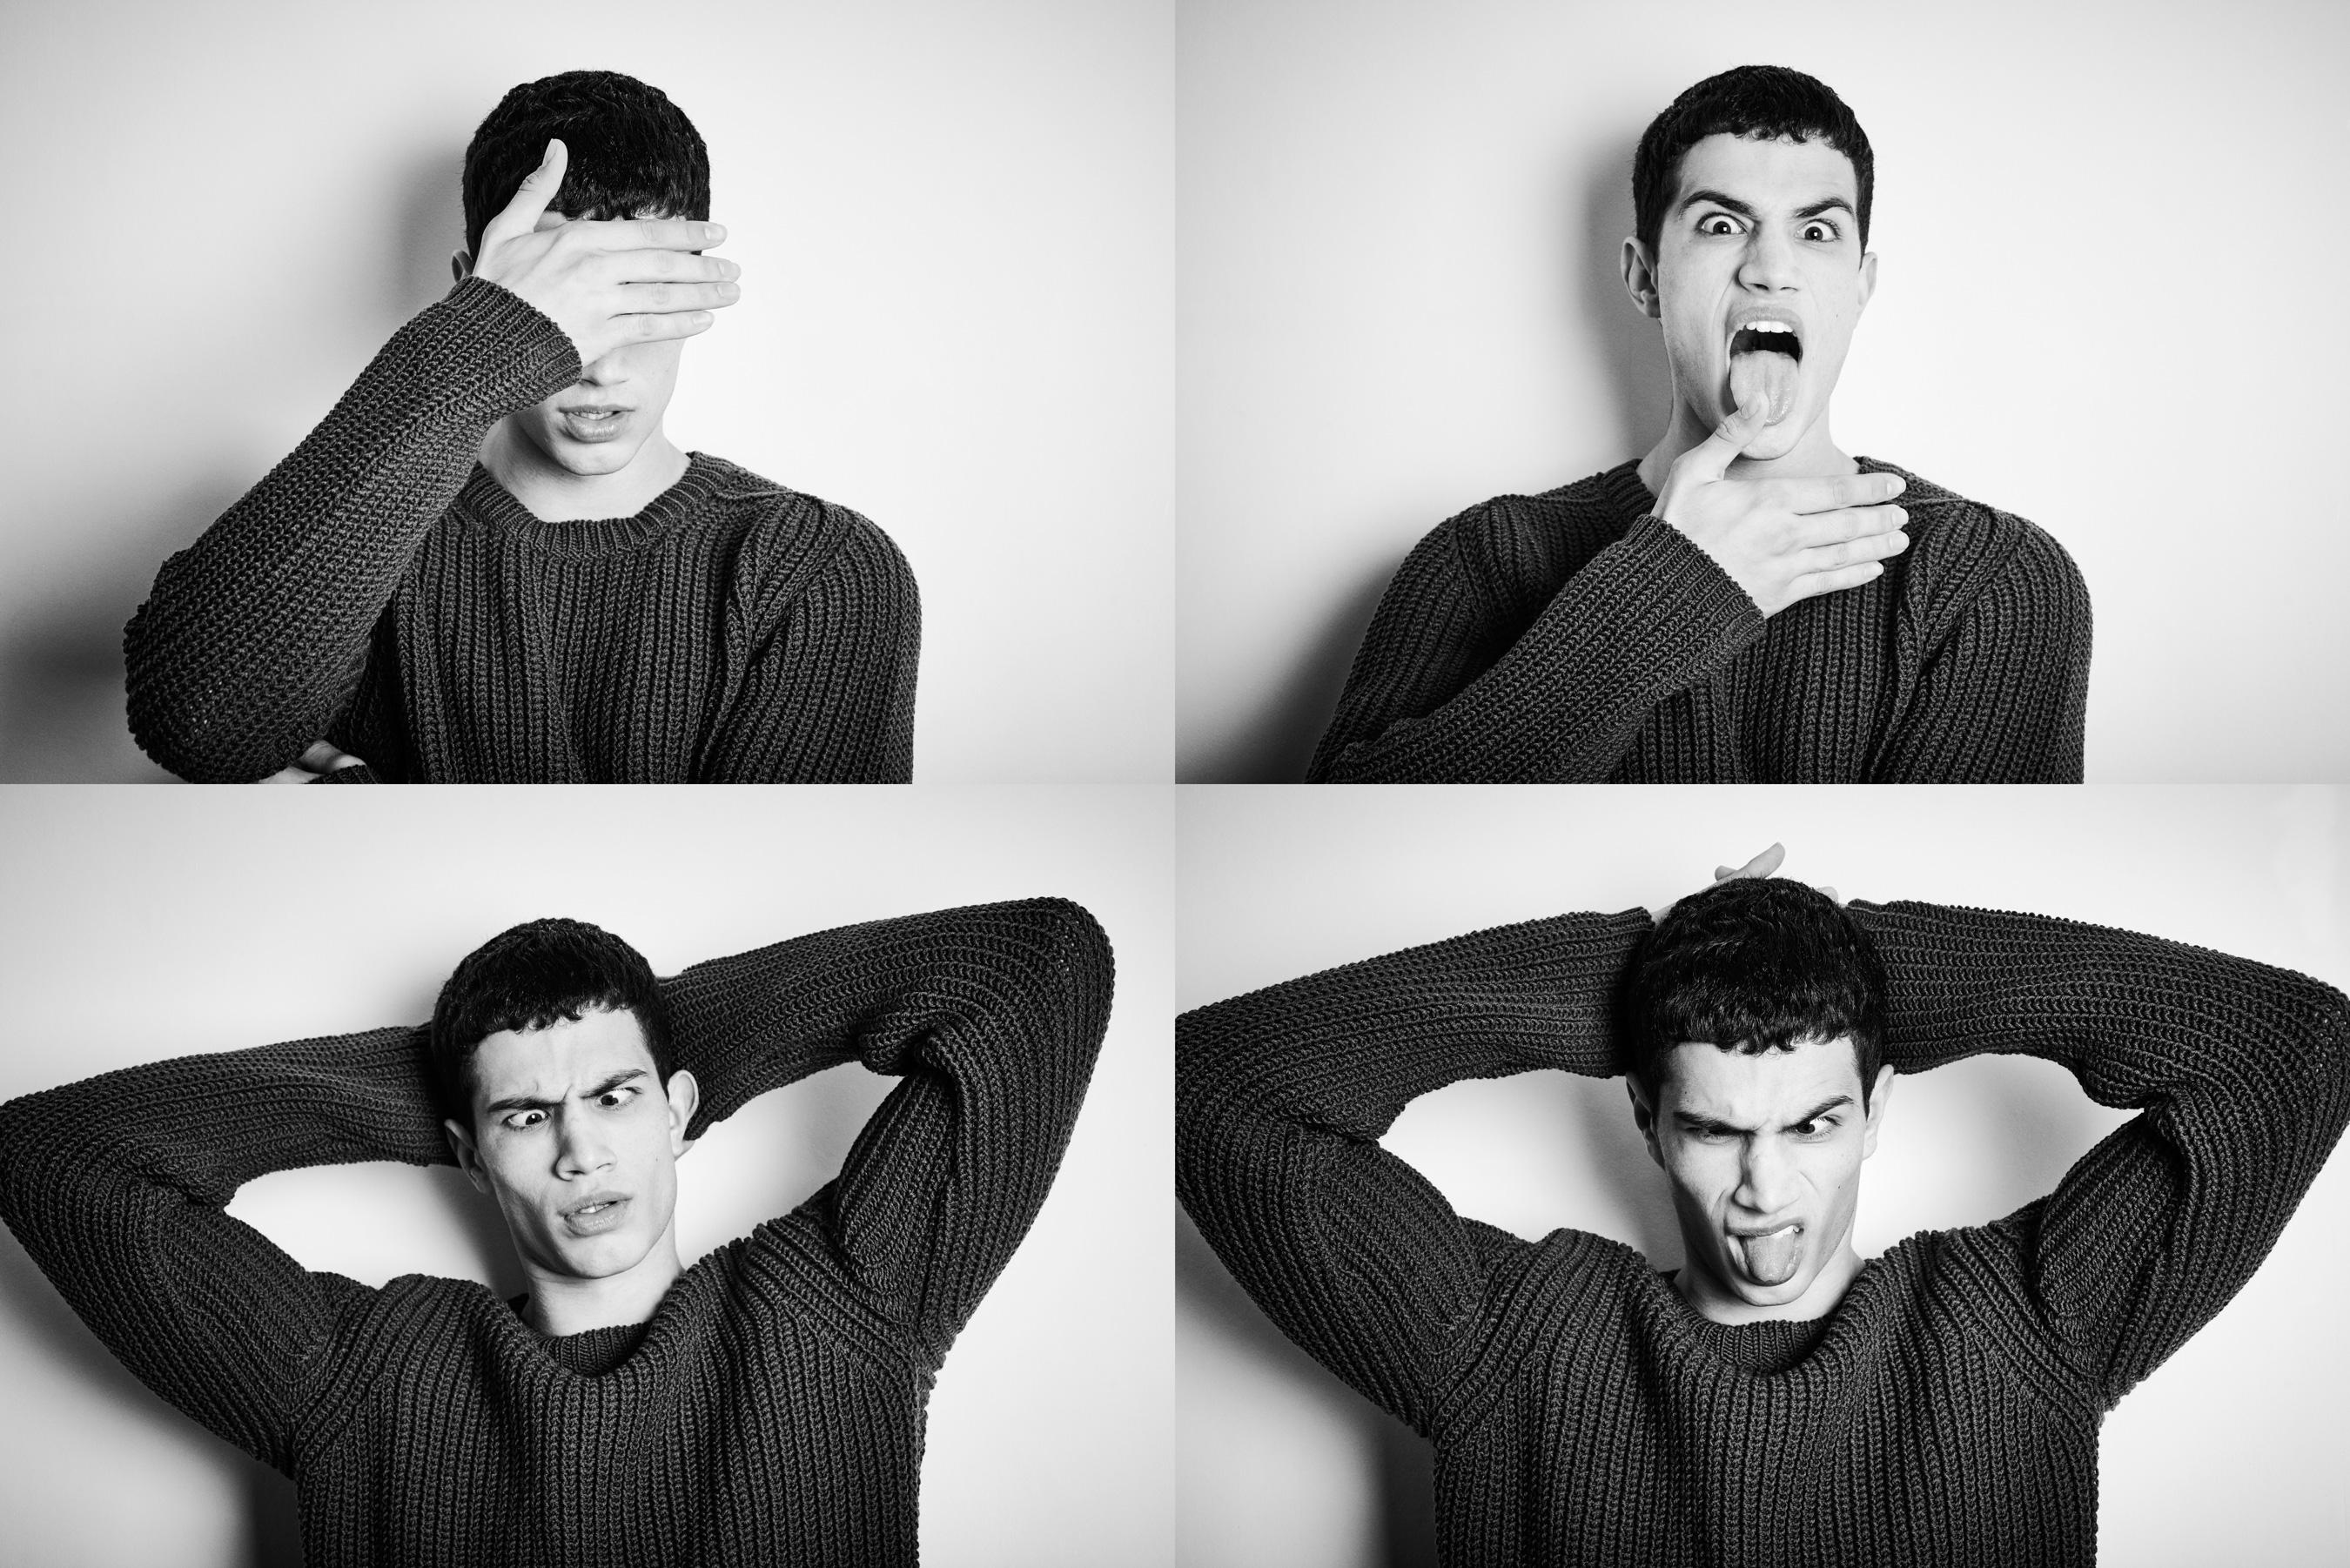 Matthew-Stansfield-Photographer-arcadia-online-ashton-gohill-intimates-301